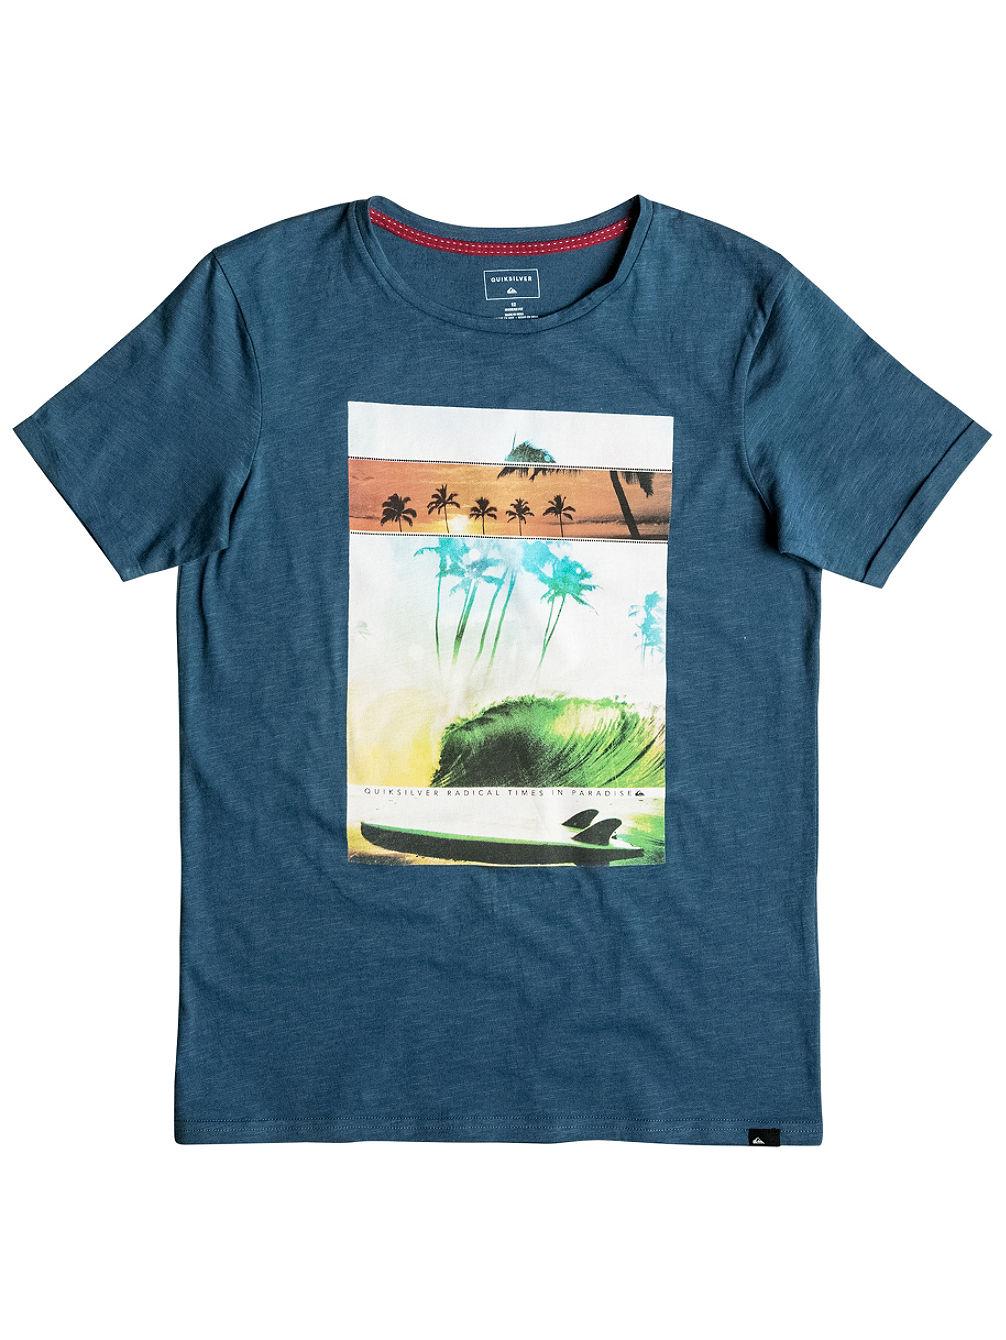 quiksilver-good-choice-t-shirt-boys